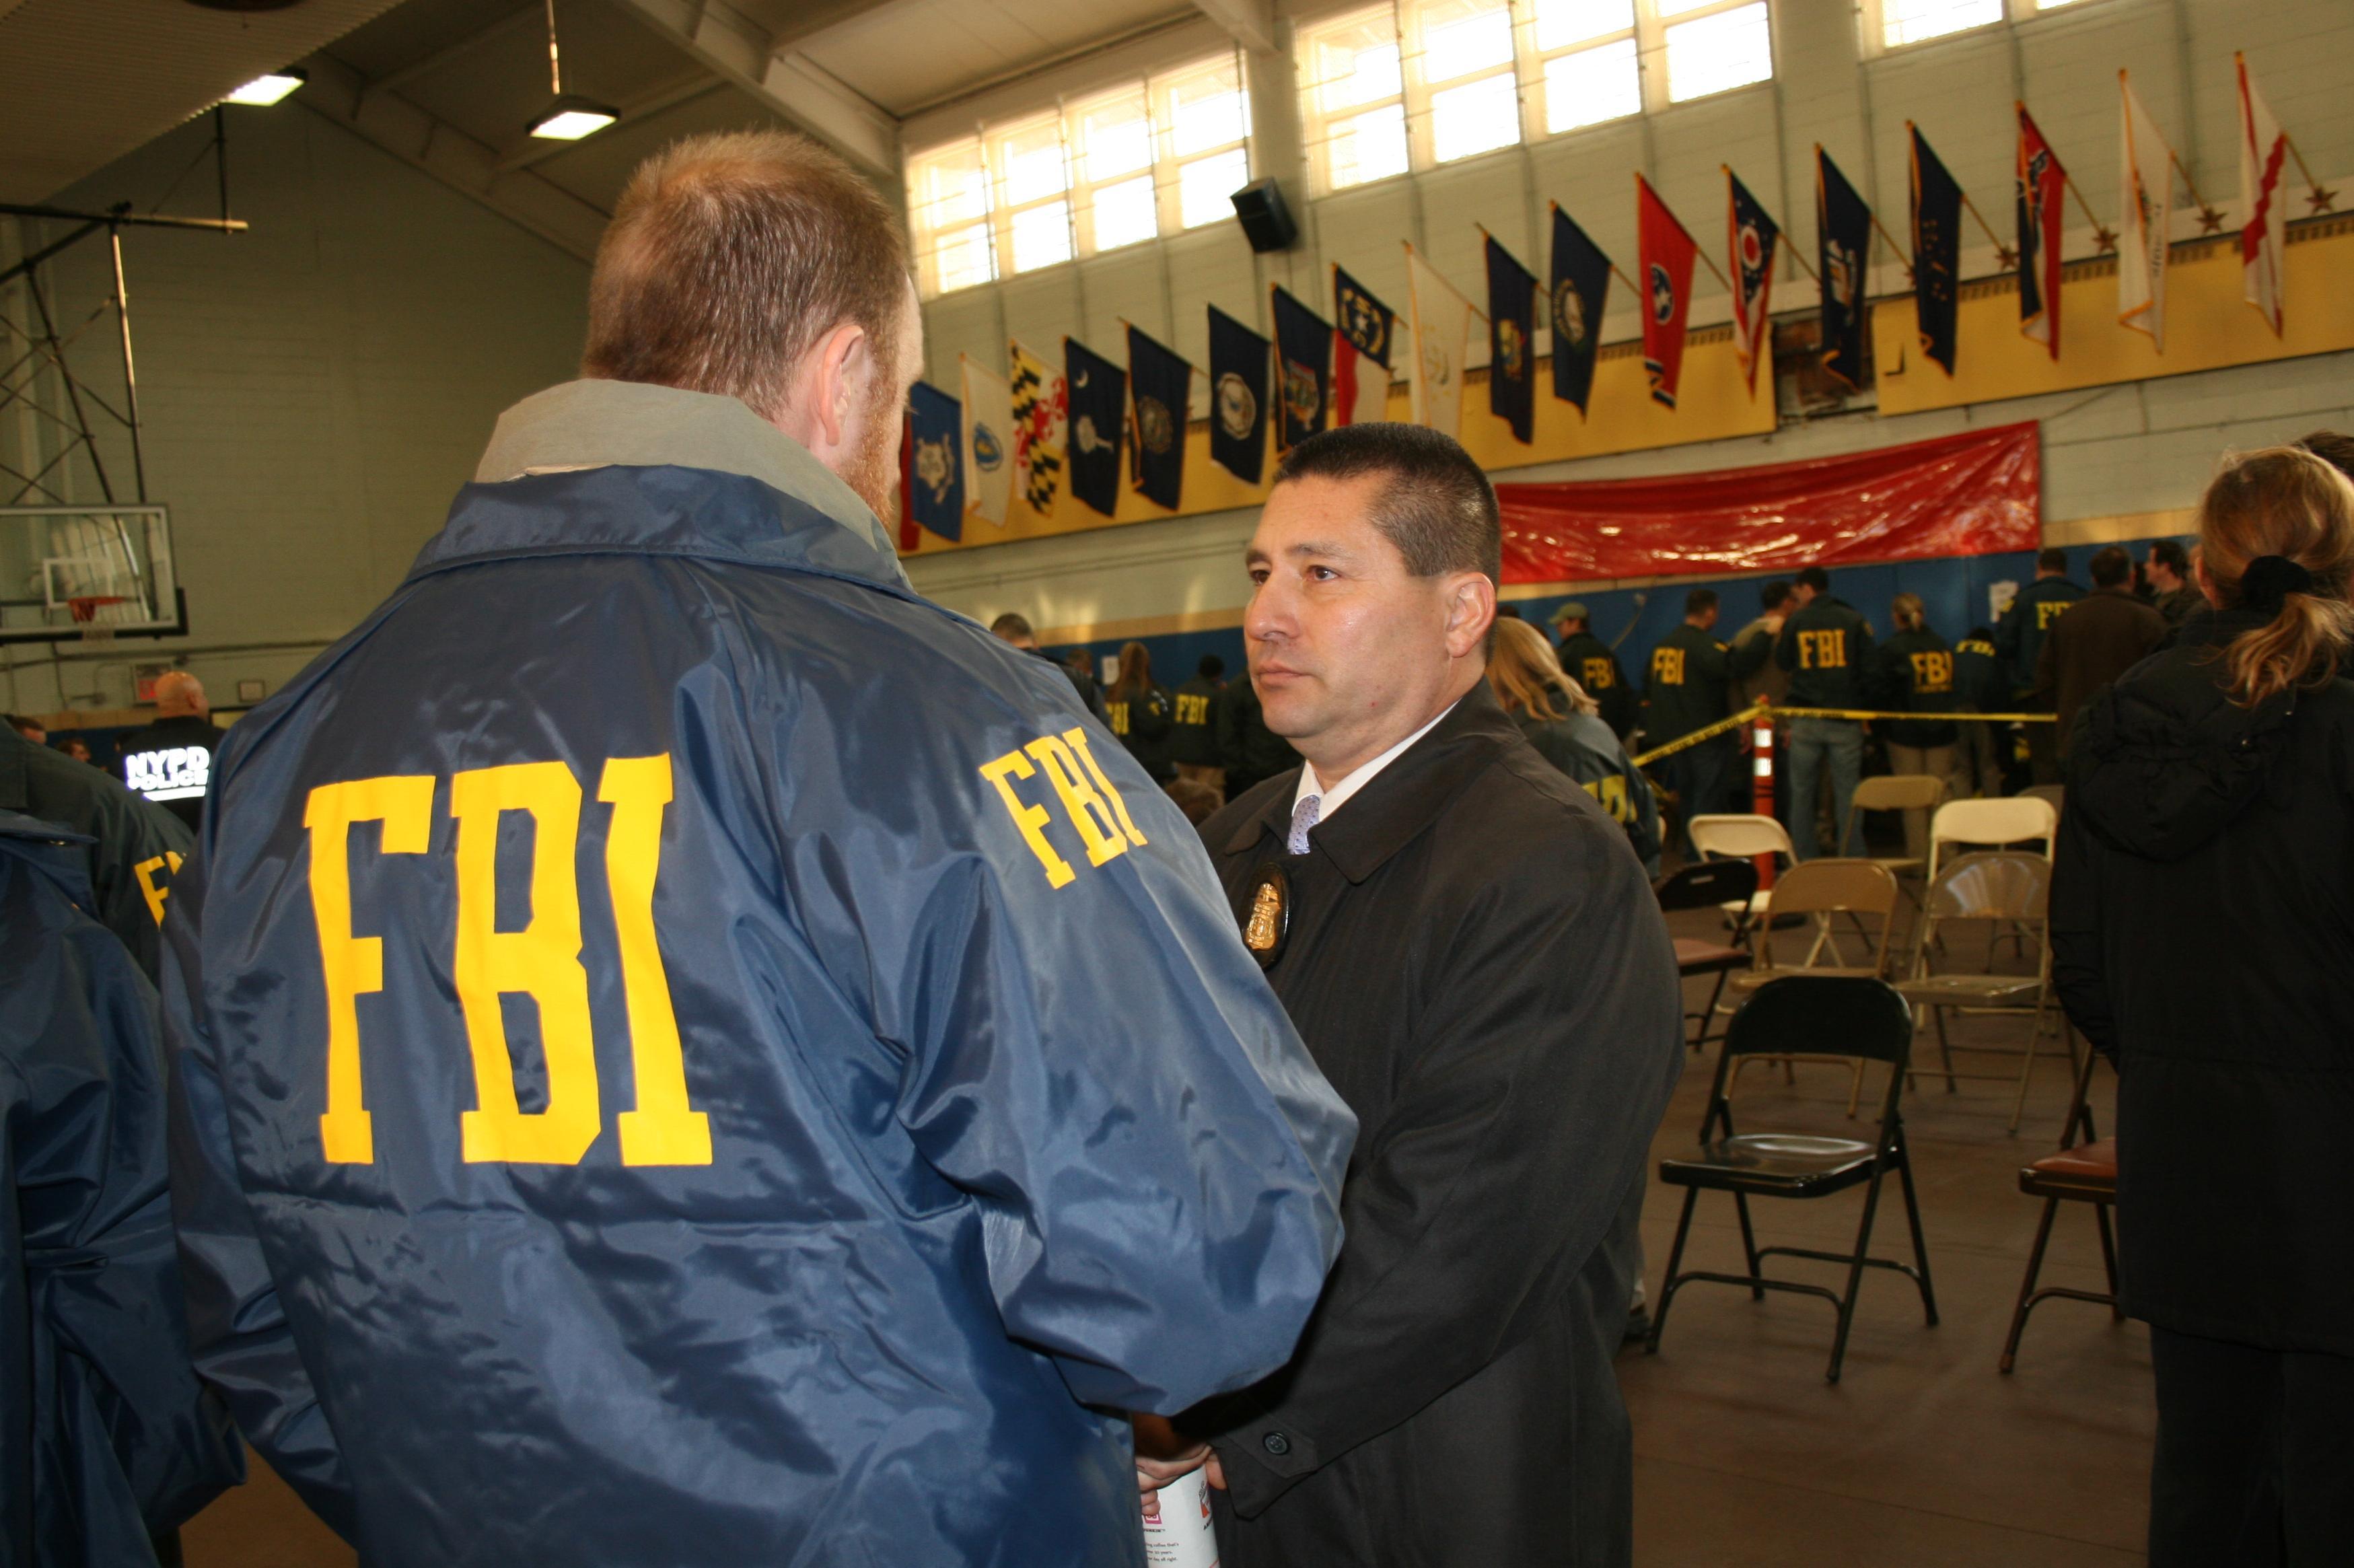 Fbi Agent Verhaftet